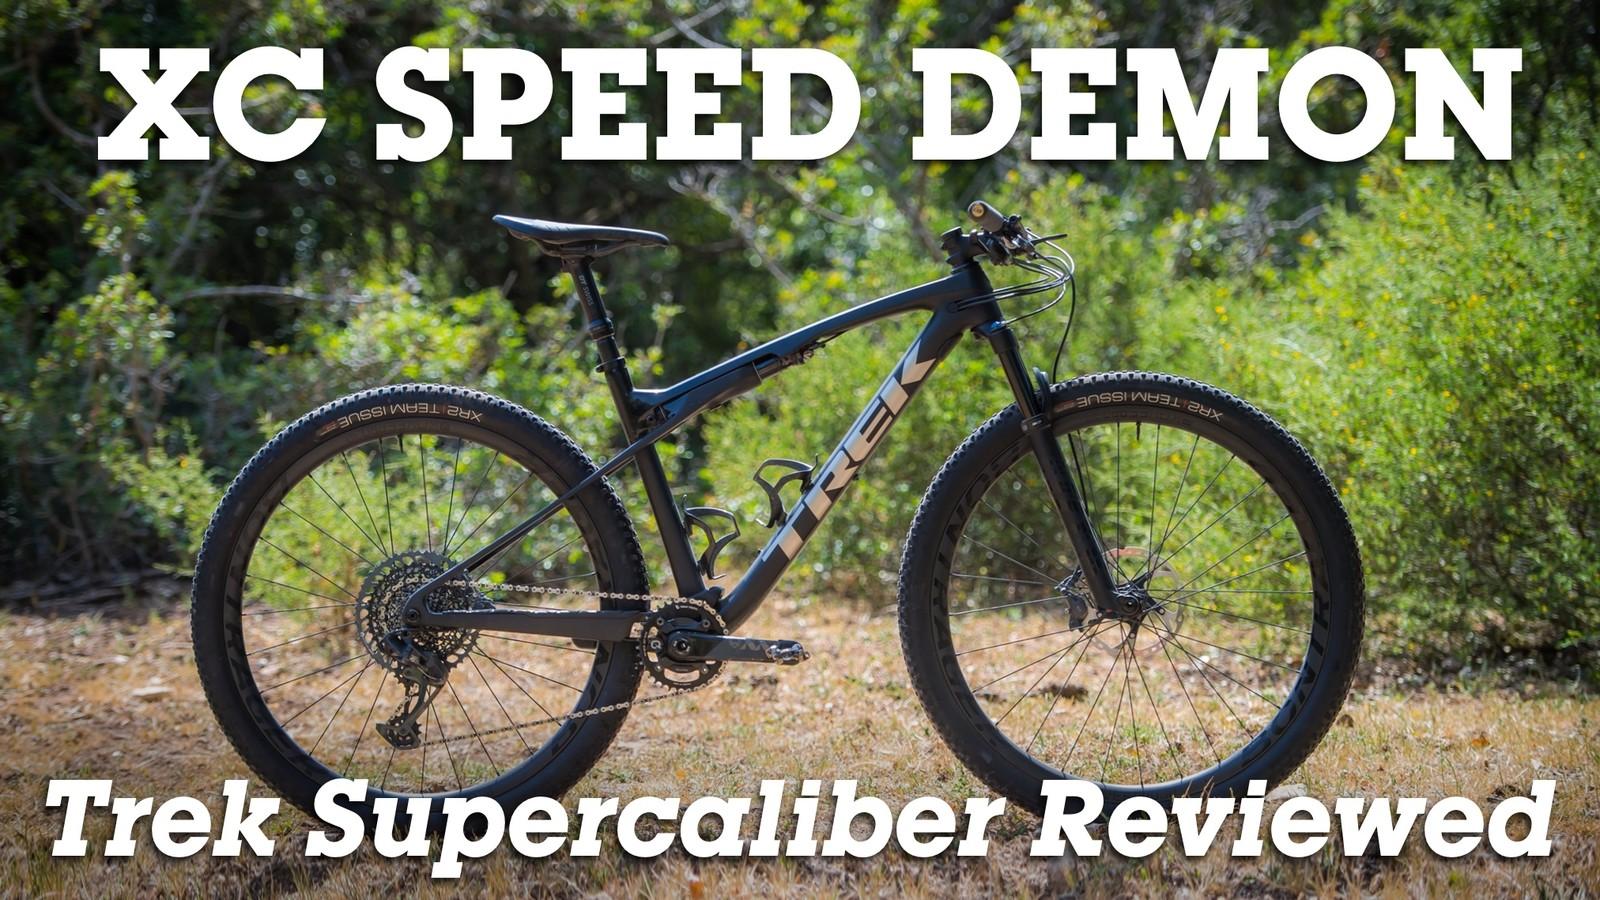 XC Speed Demon: Trek Supercaliber Review